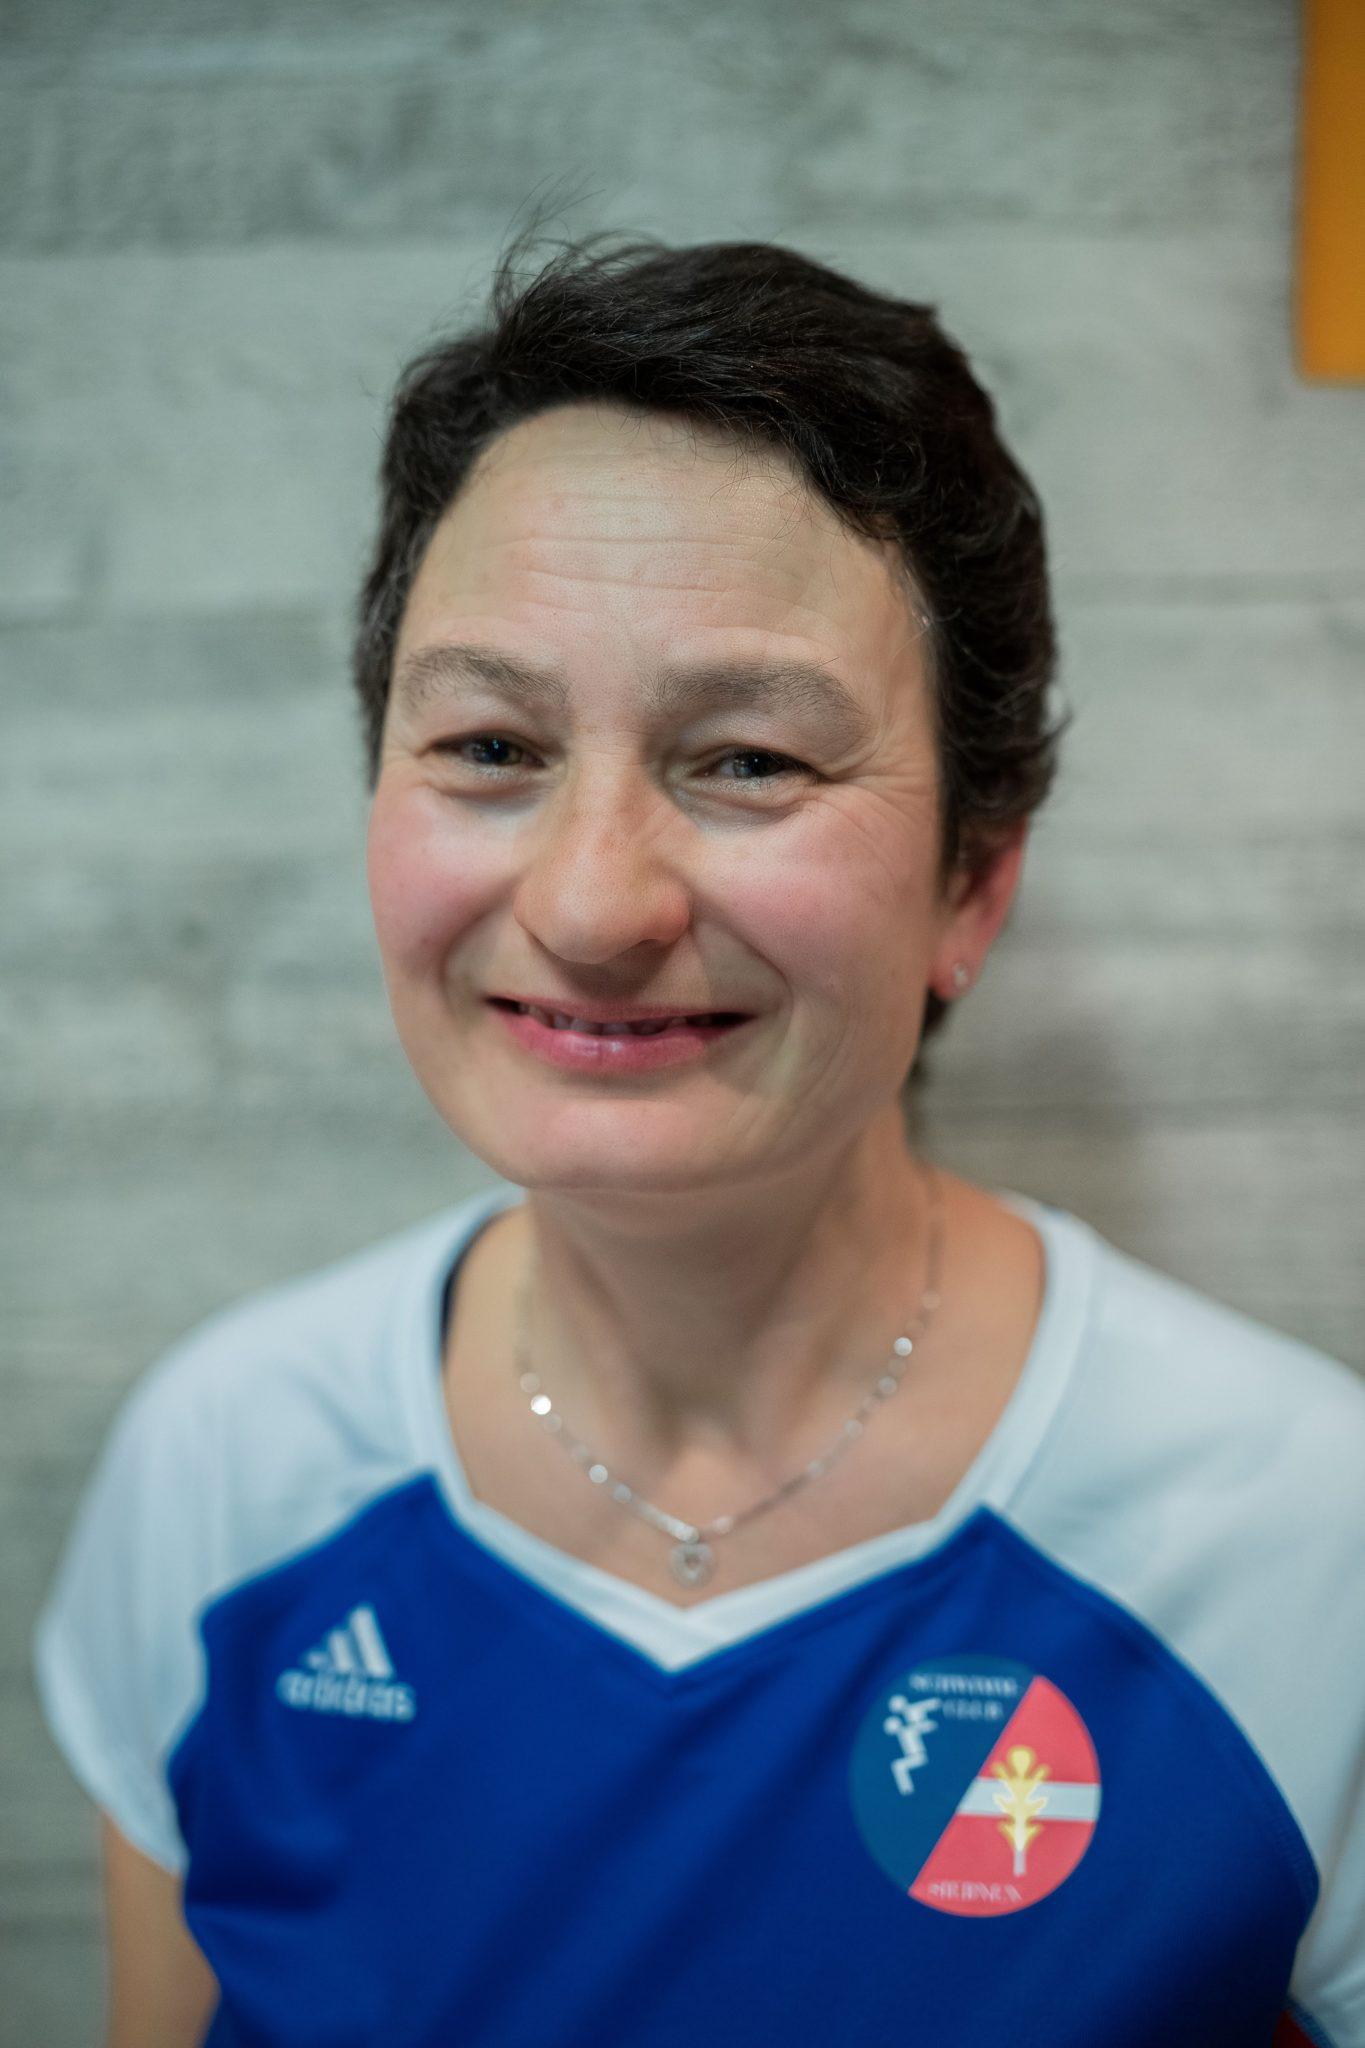 Silvia Geissbühler